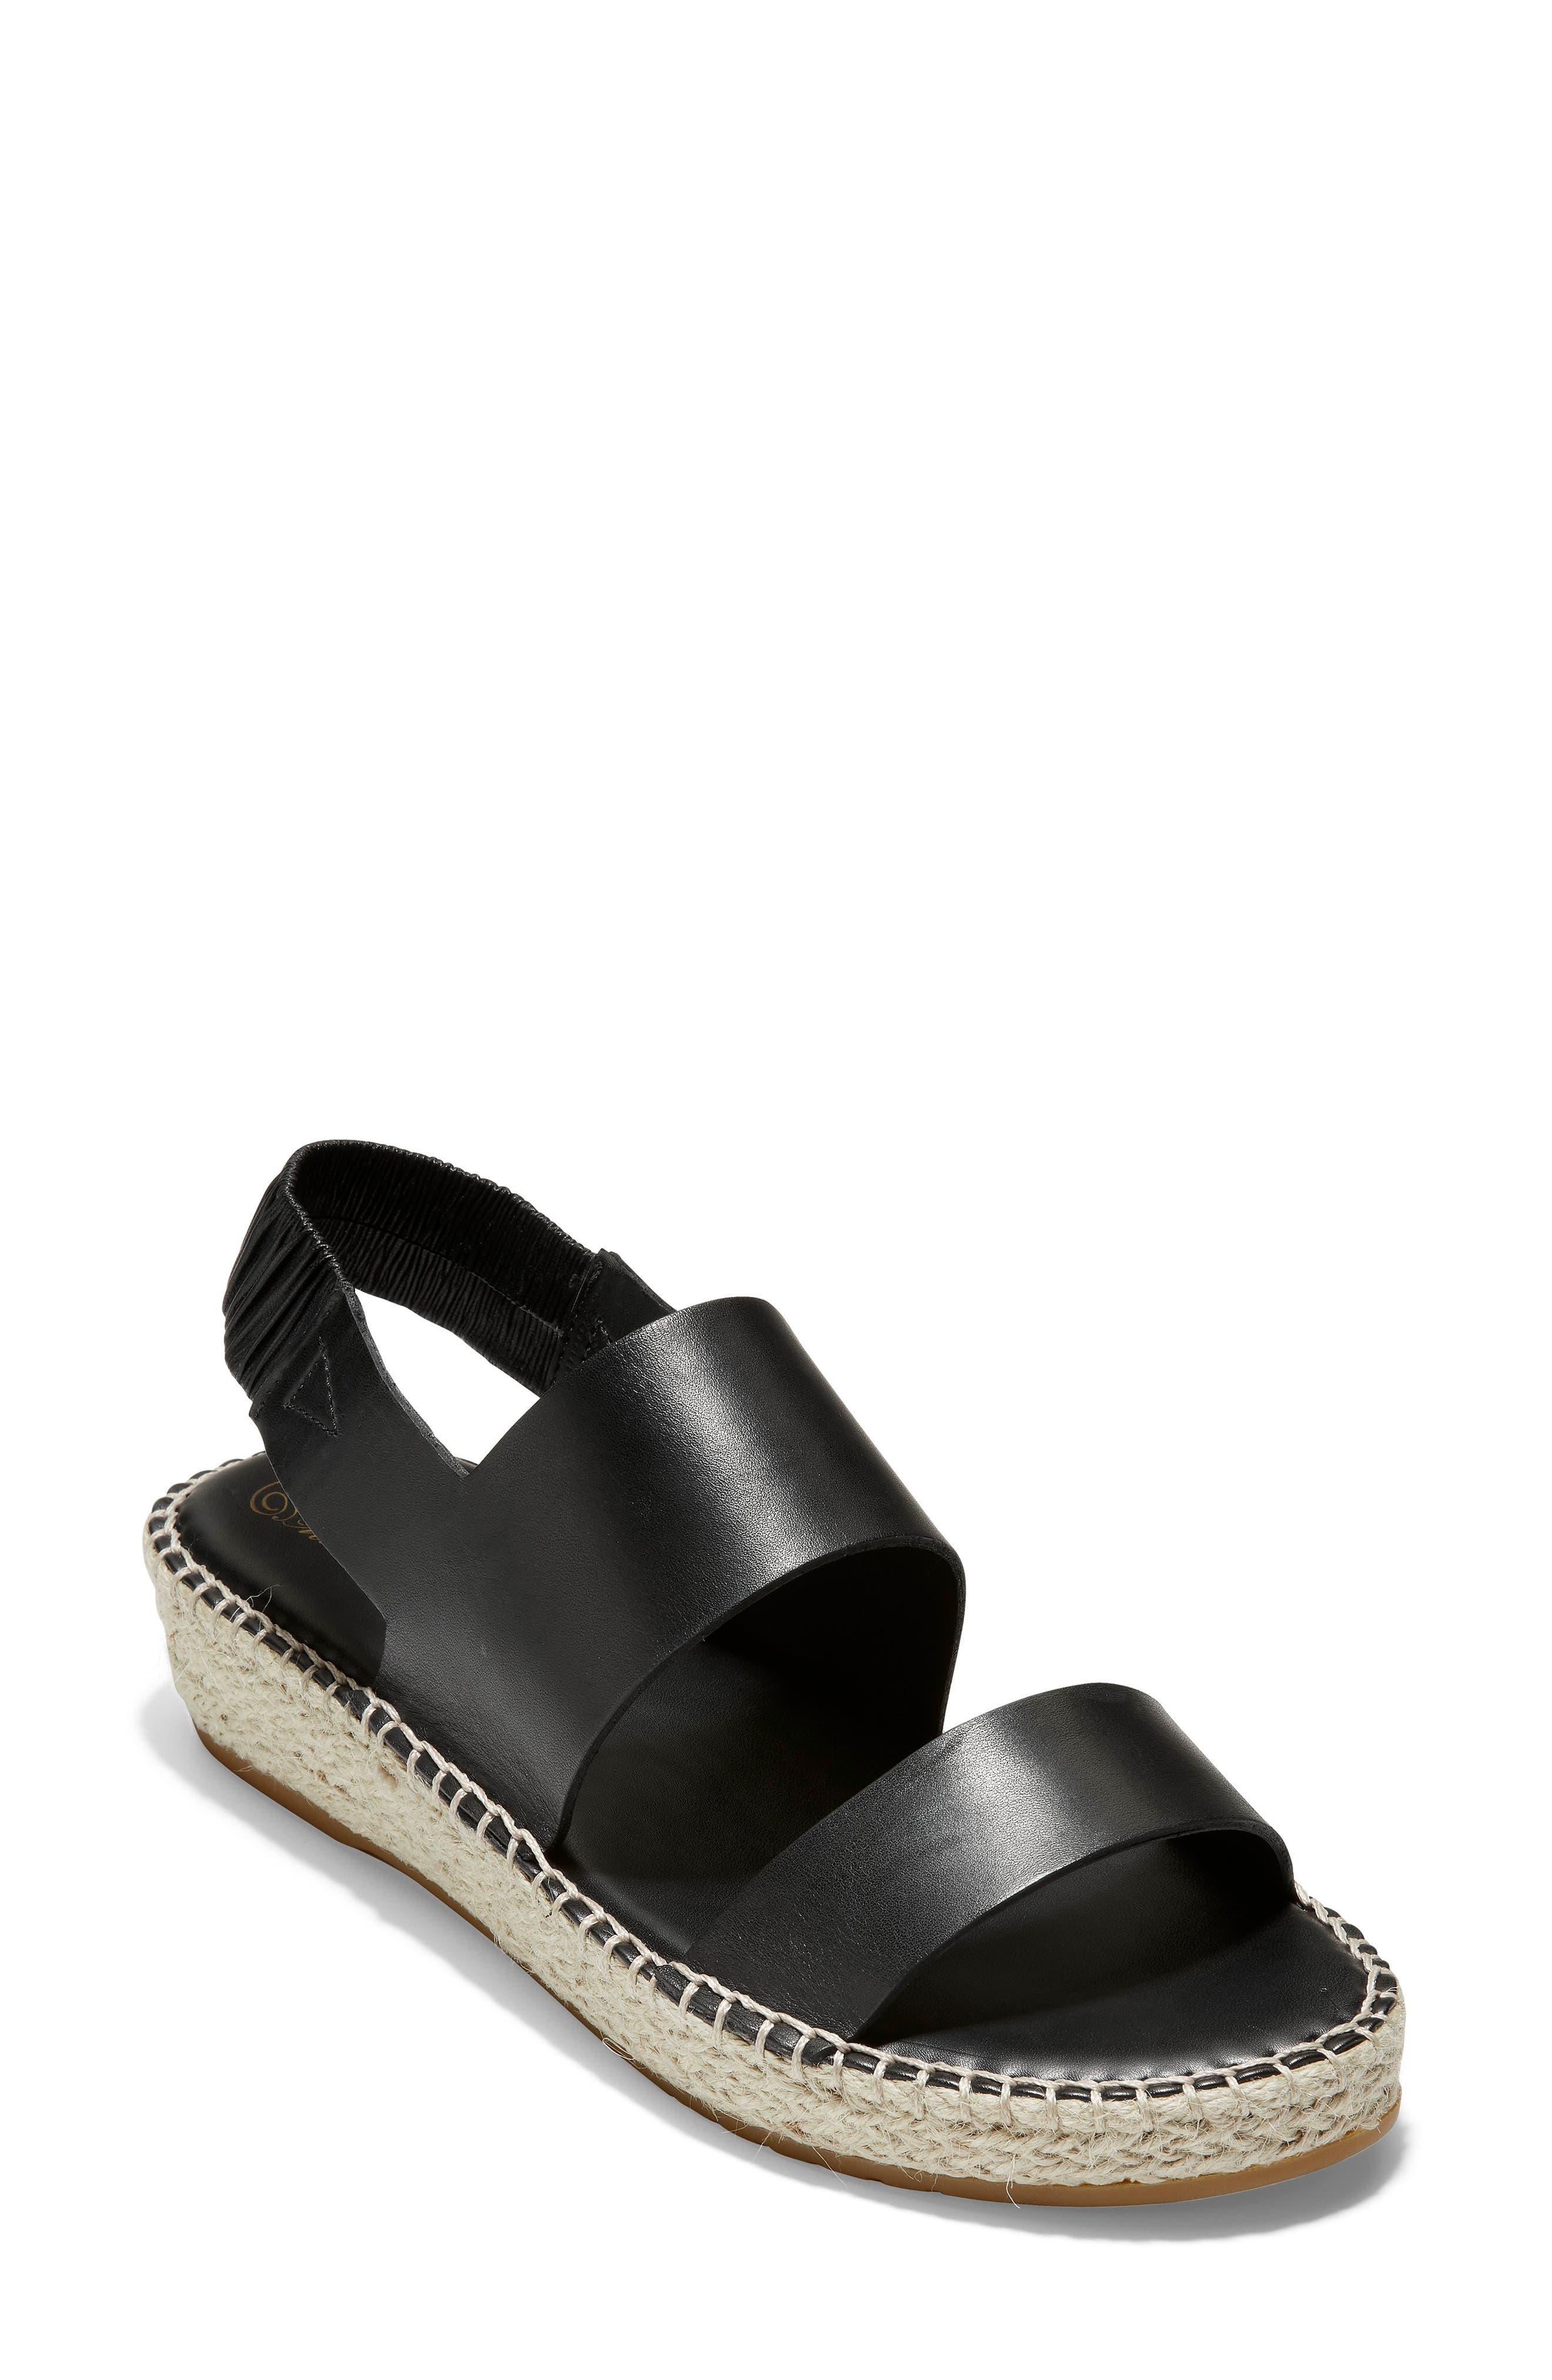 da4d62aca4d Cole Haan Women s Cloudfeel Slingback Platform Espadrille Sandals In Black  Leather